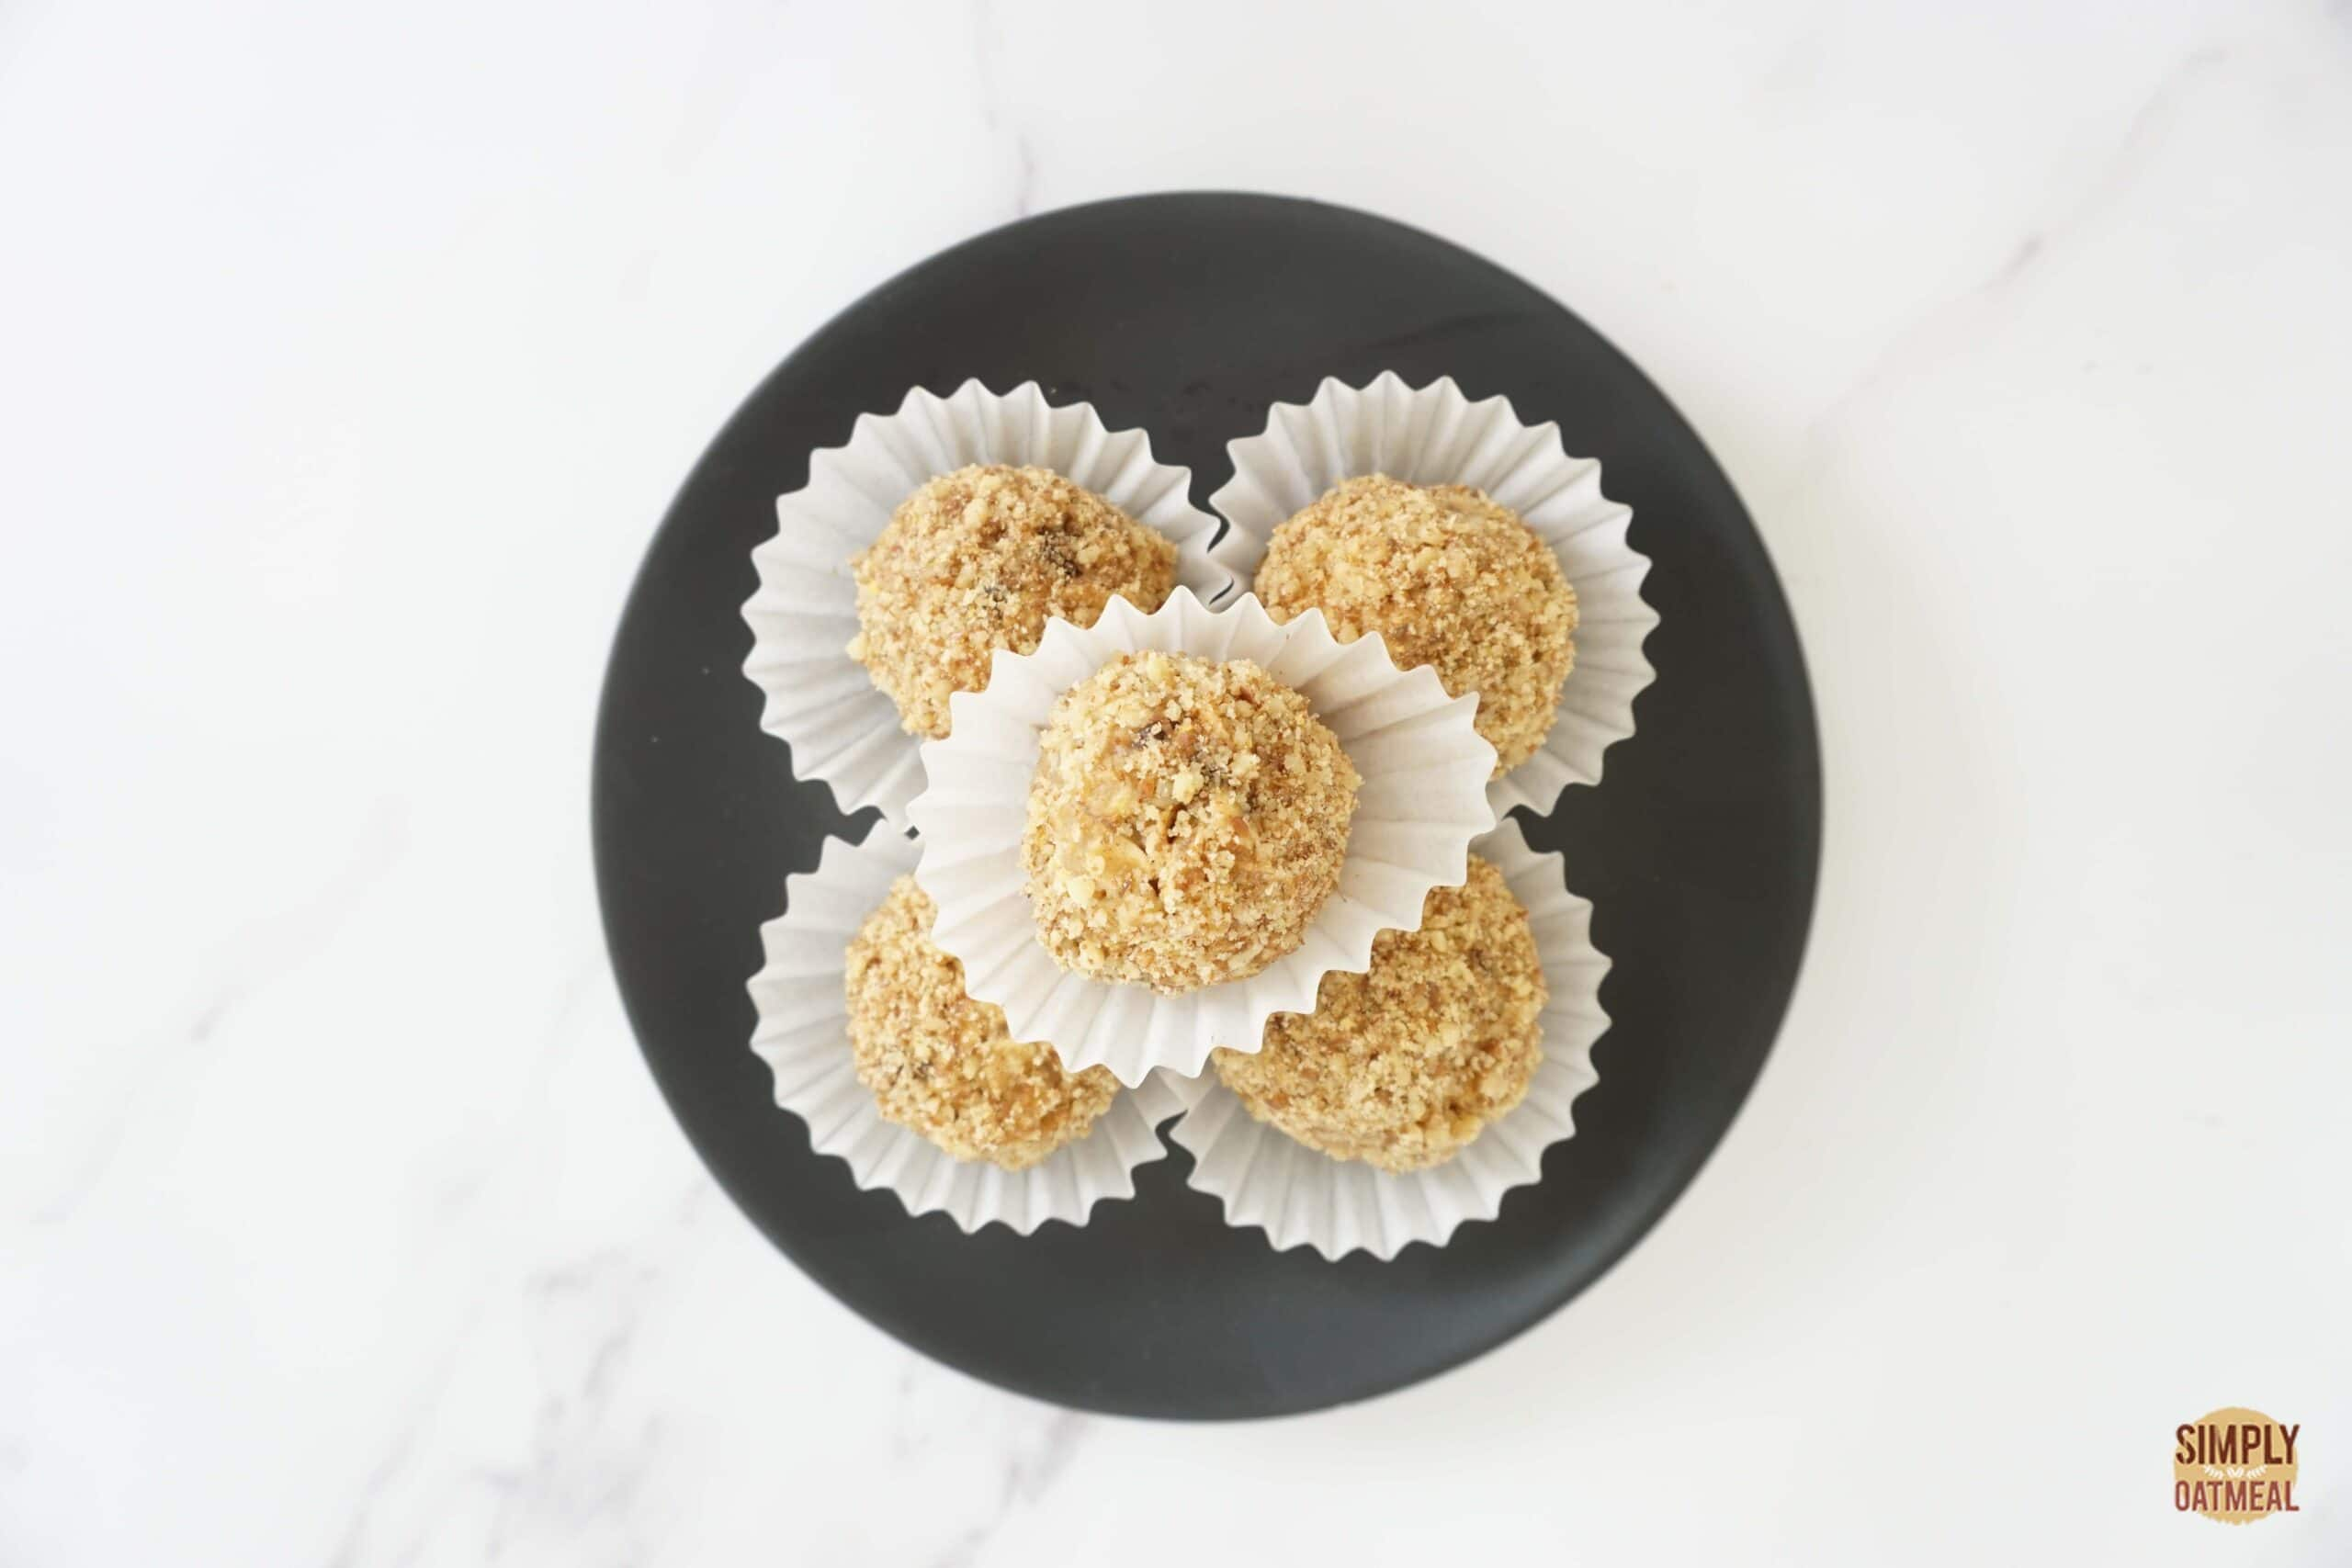 5 no bake banana walnut oatmeal balls in small paper cups